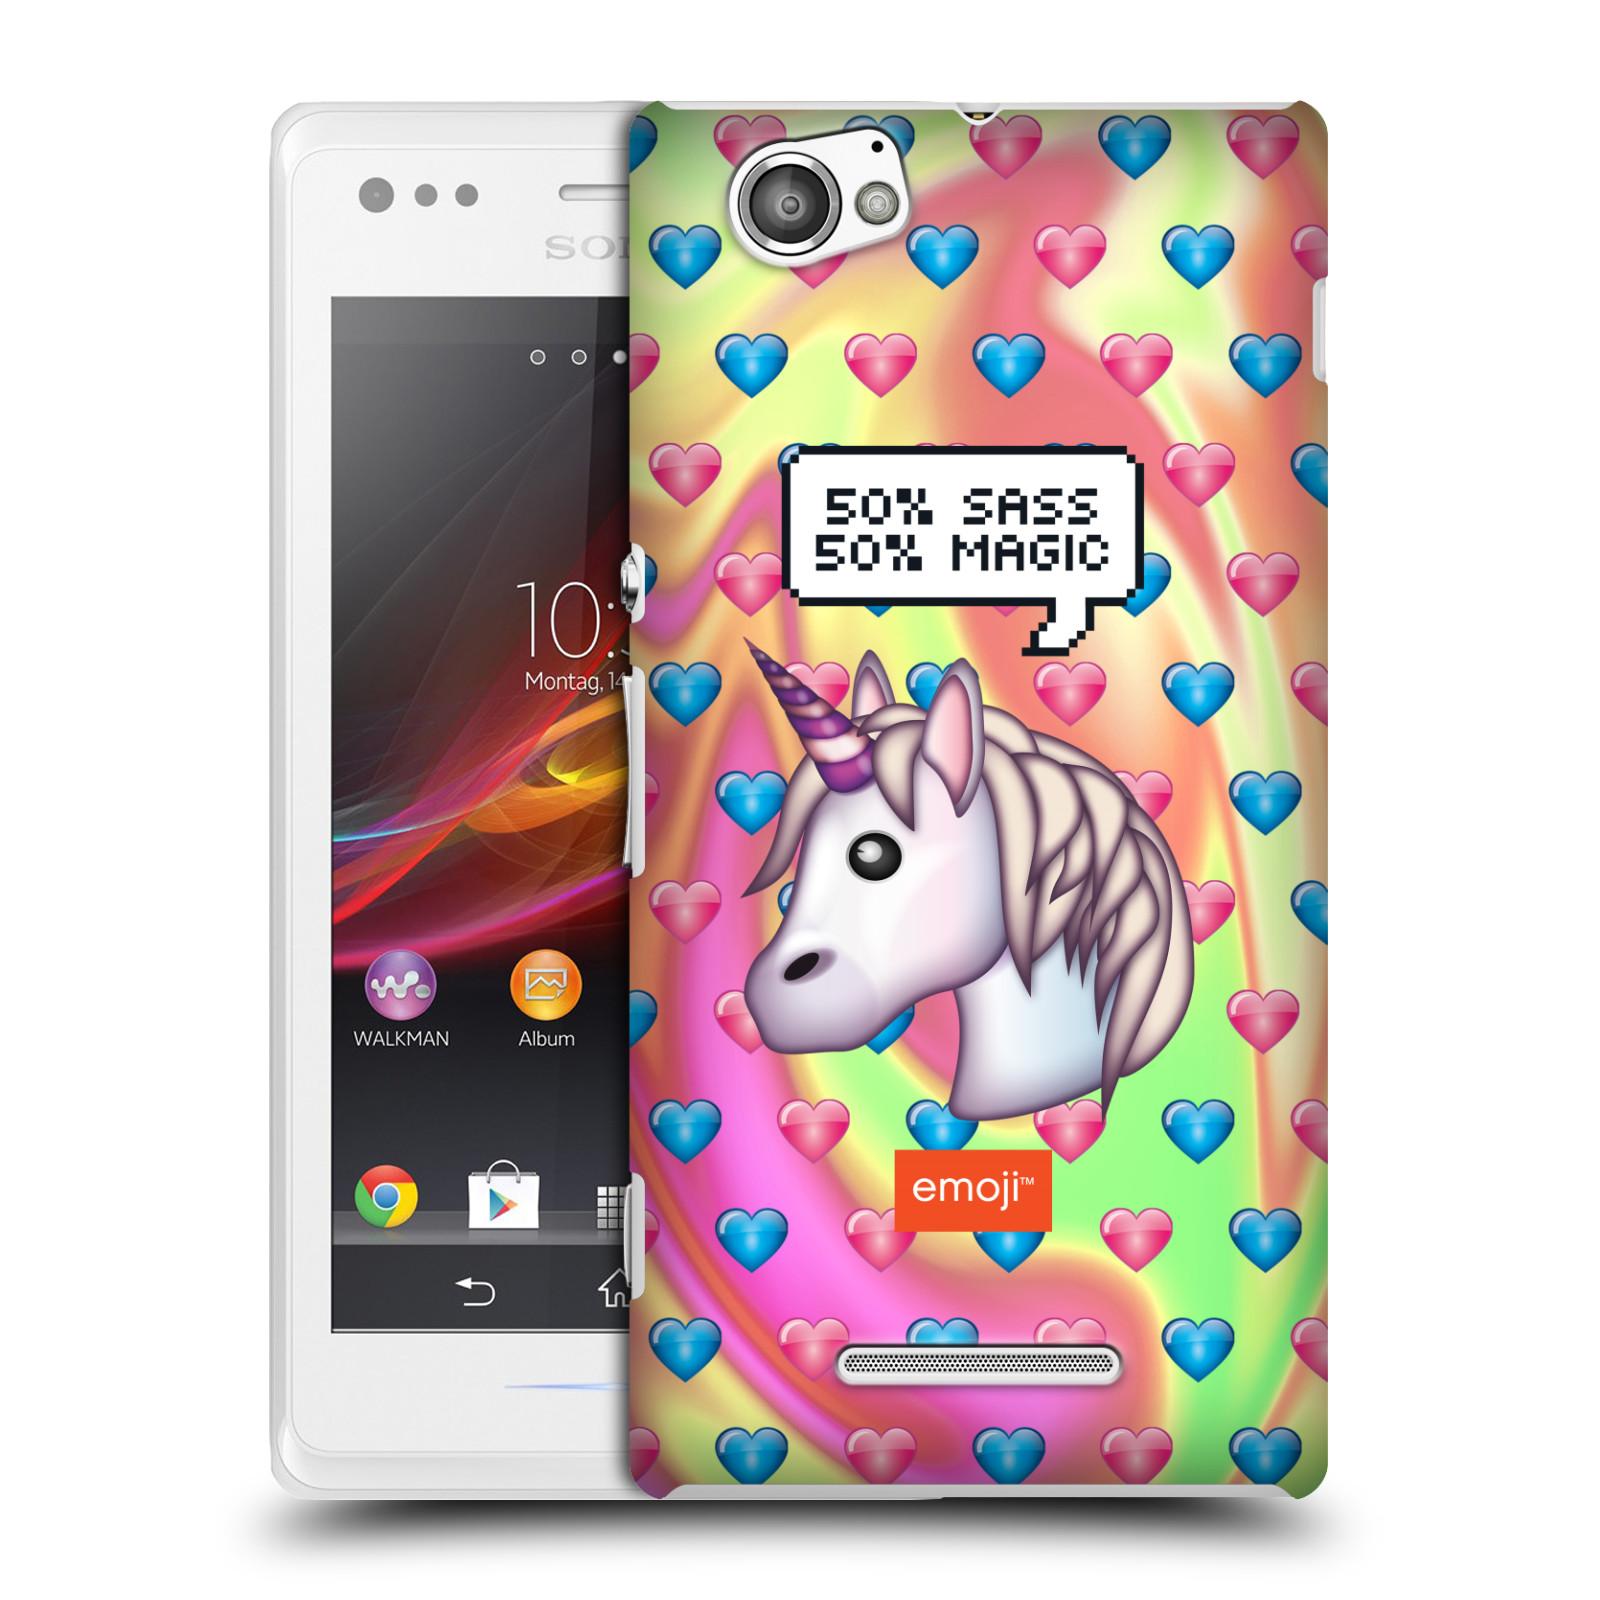 Plastové pouzdro na mobil Sony Xperia M C1905 HEAD CASE EMOJI - Jednorožec (Kryt či obal s oficiálním motivem EMOJI na mobilní telefon Sony Xperia M )